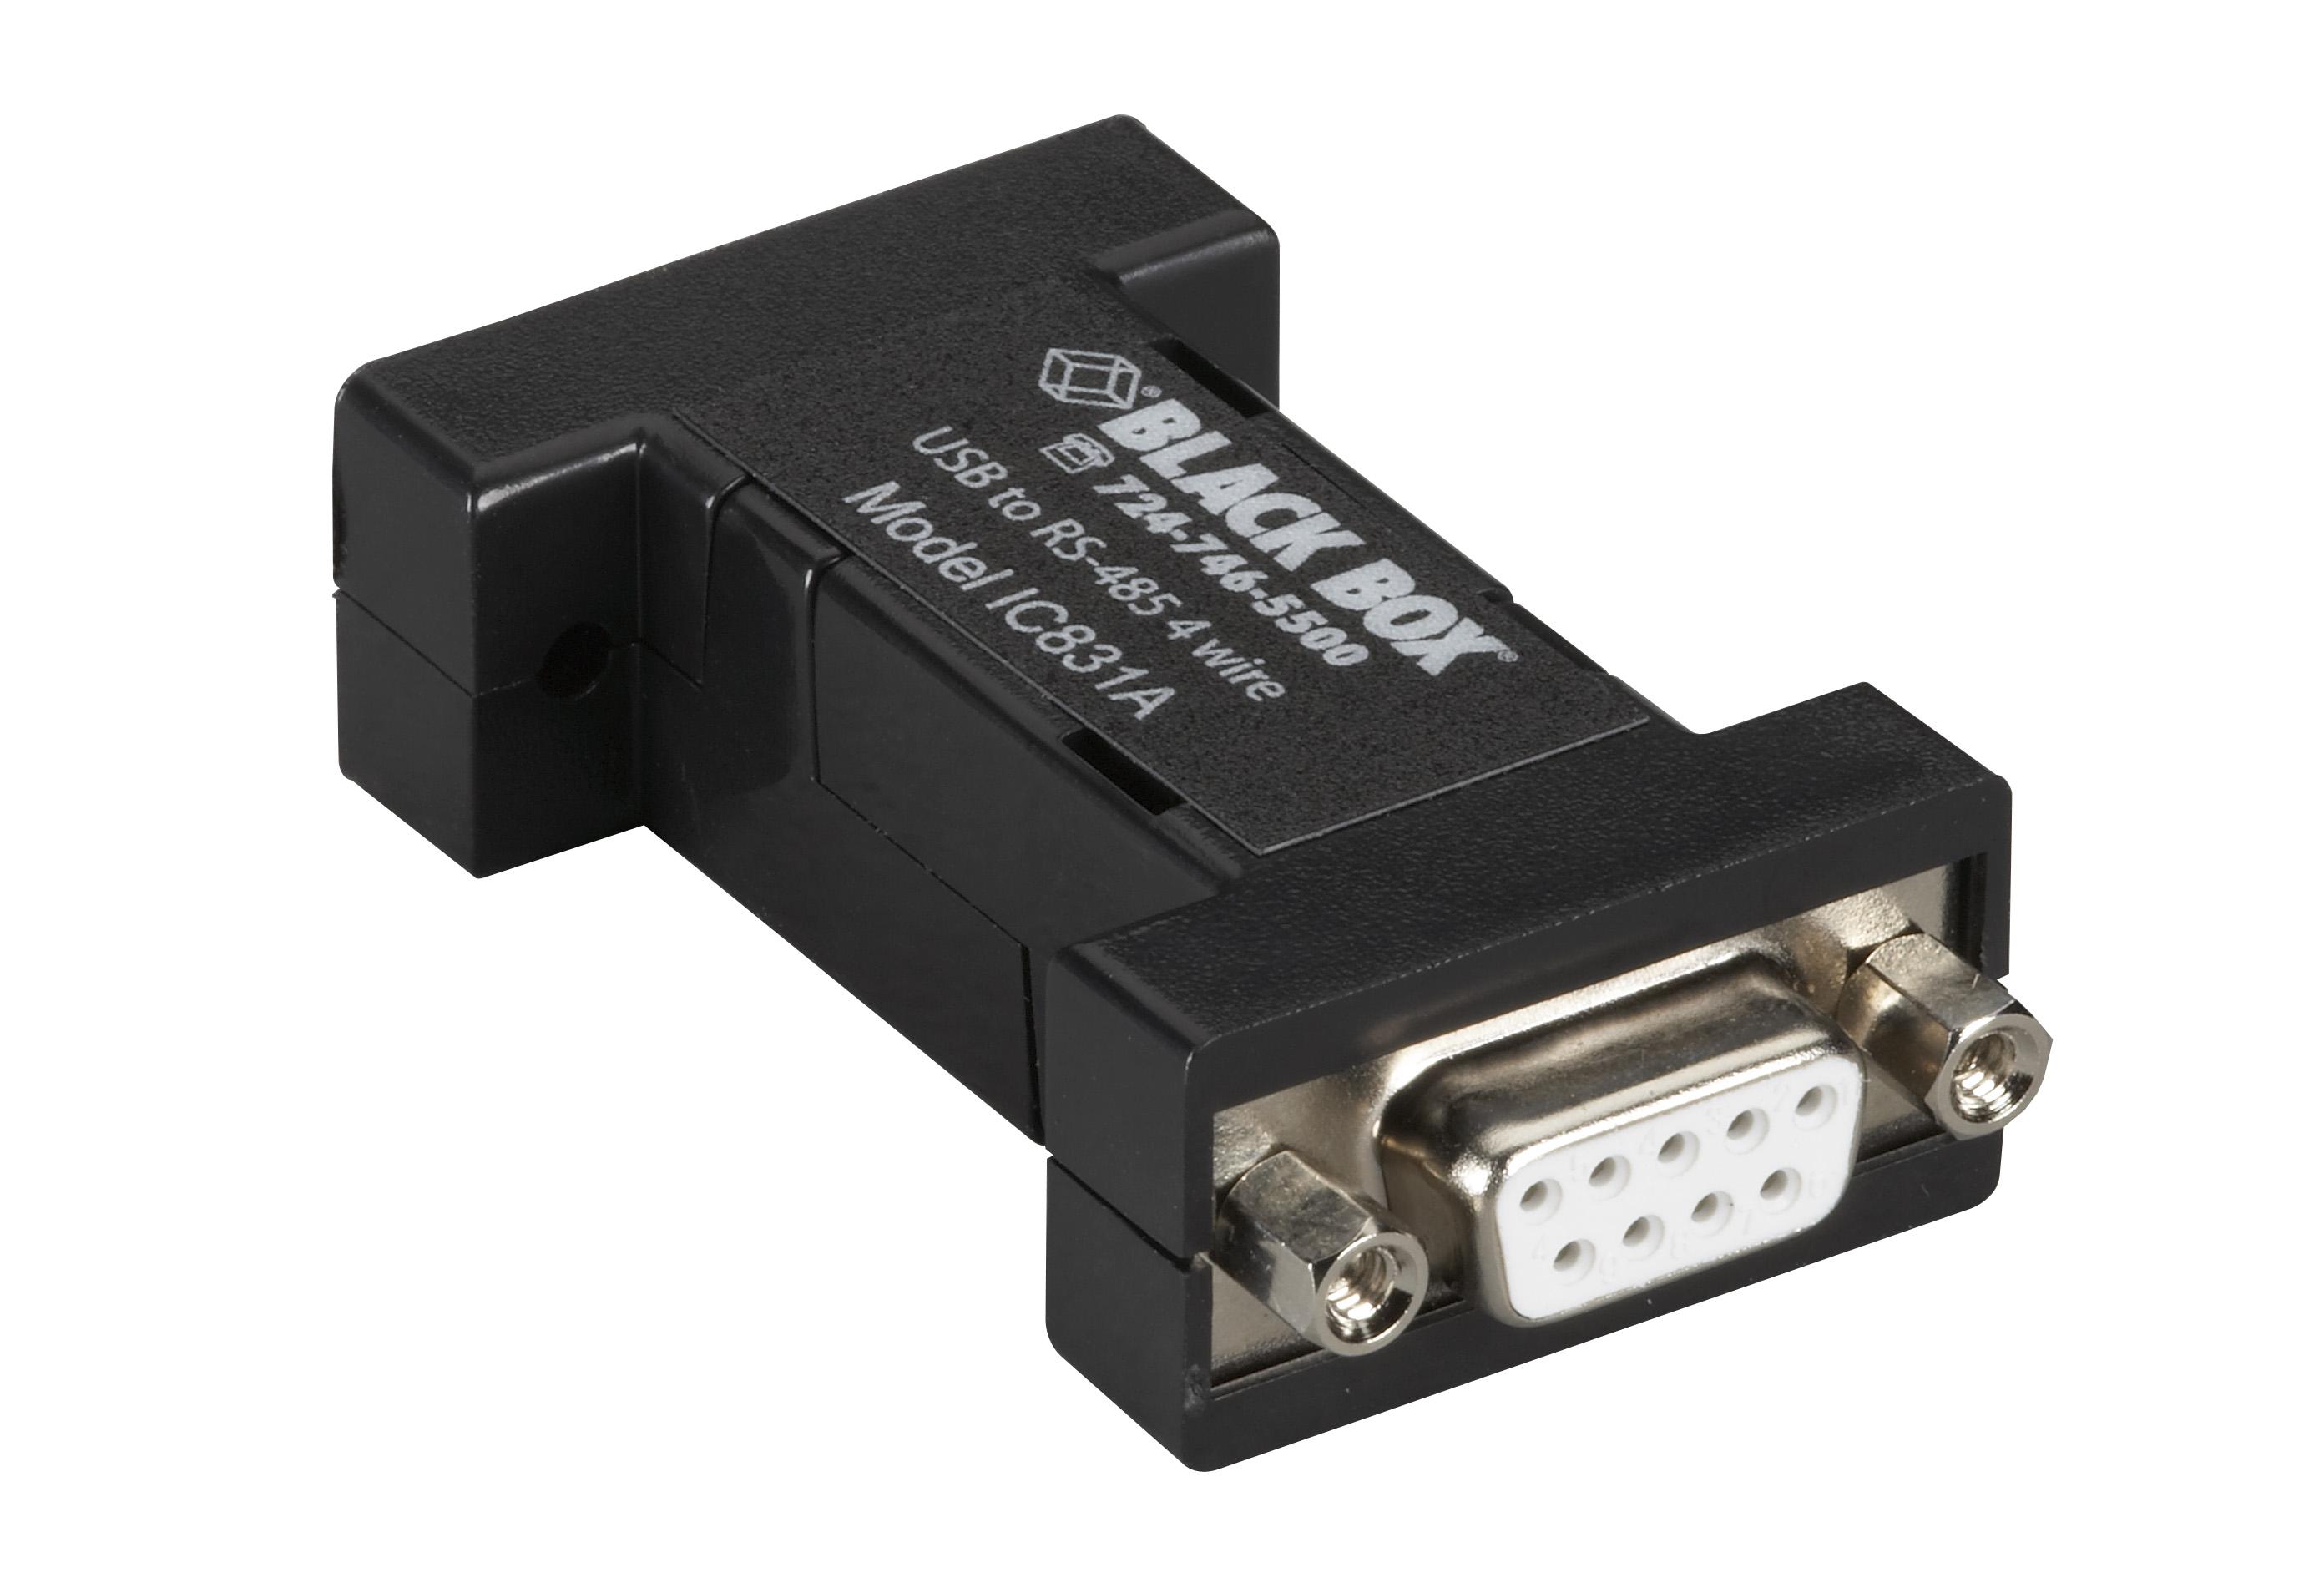 rs485 wiring crabtree 2 way light switch diagram usb to 4 wire converter db9 1 port black box